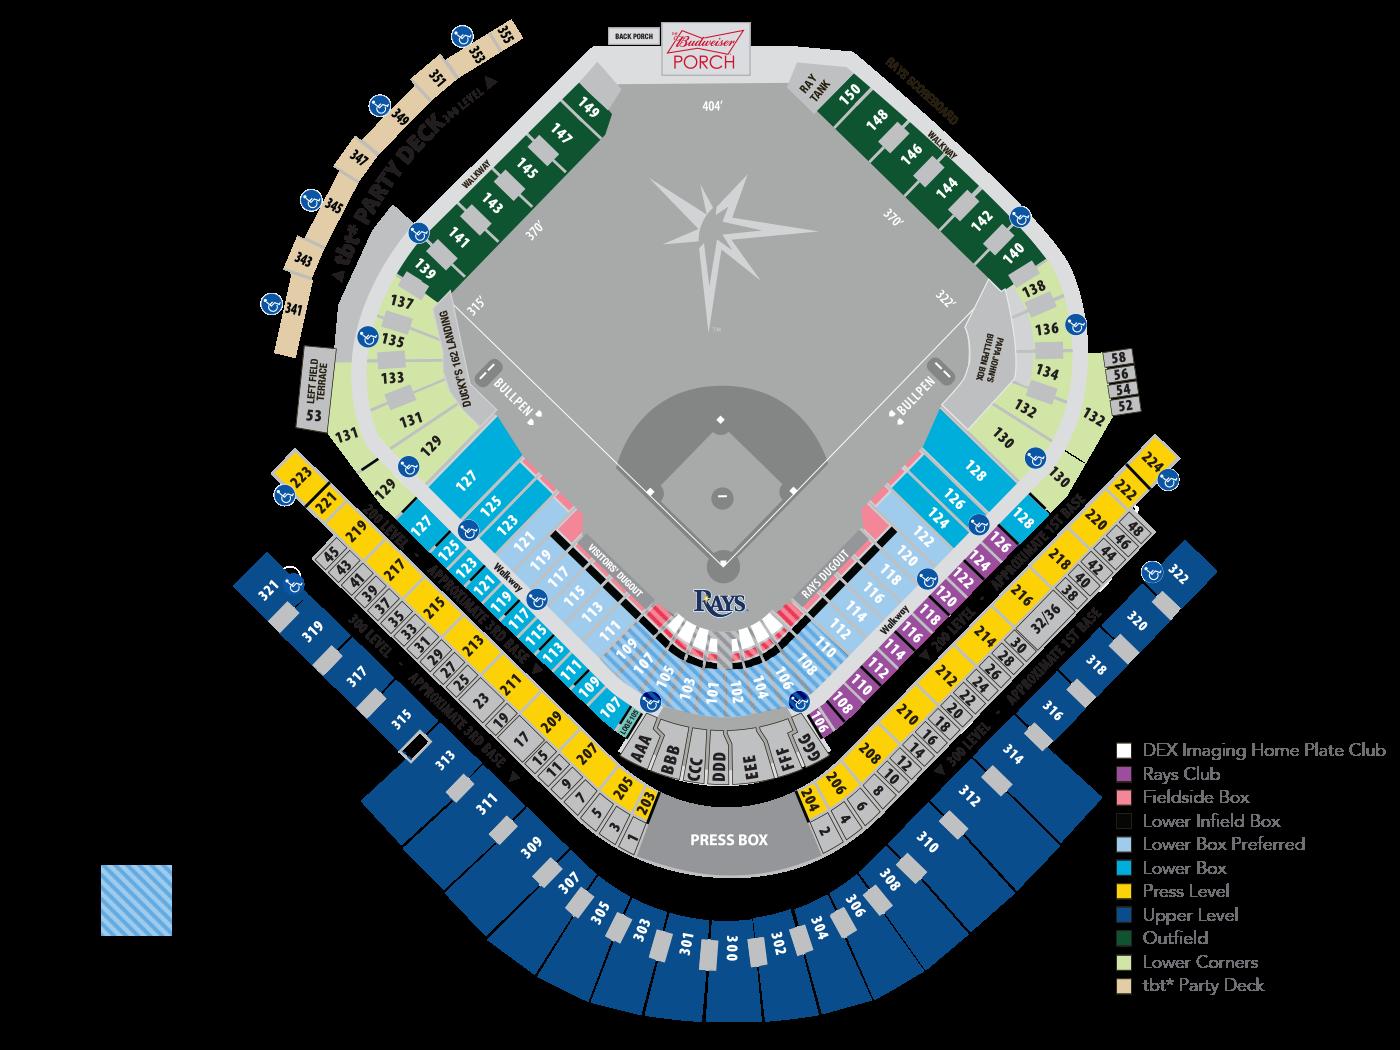 Rays Seating Map | MLB.com